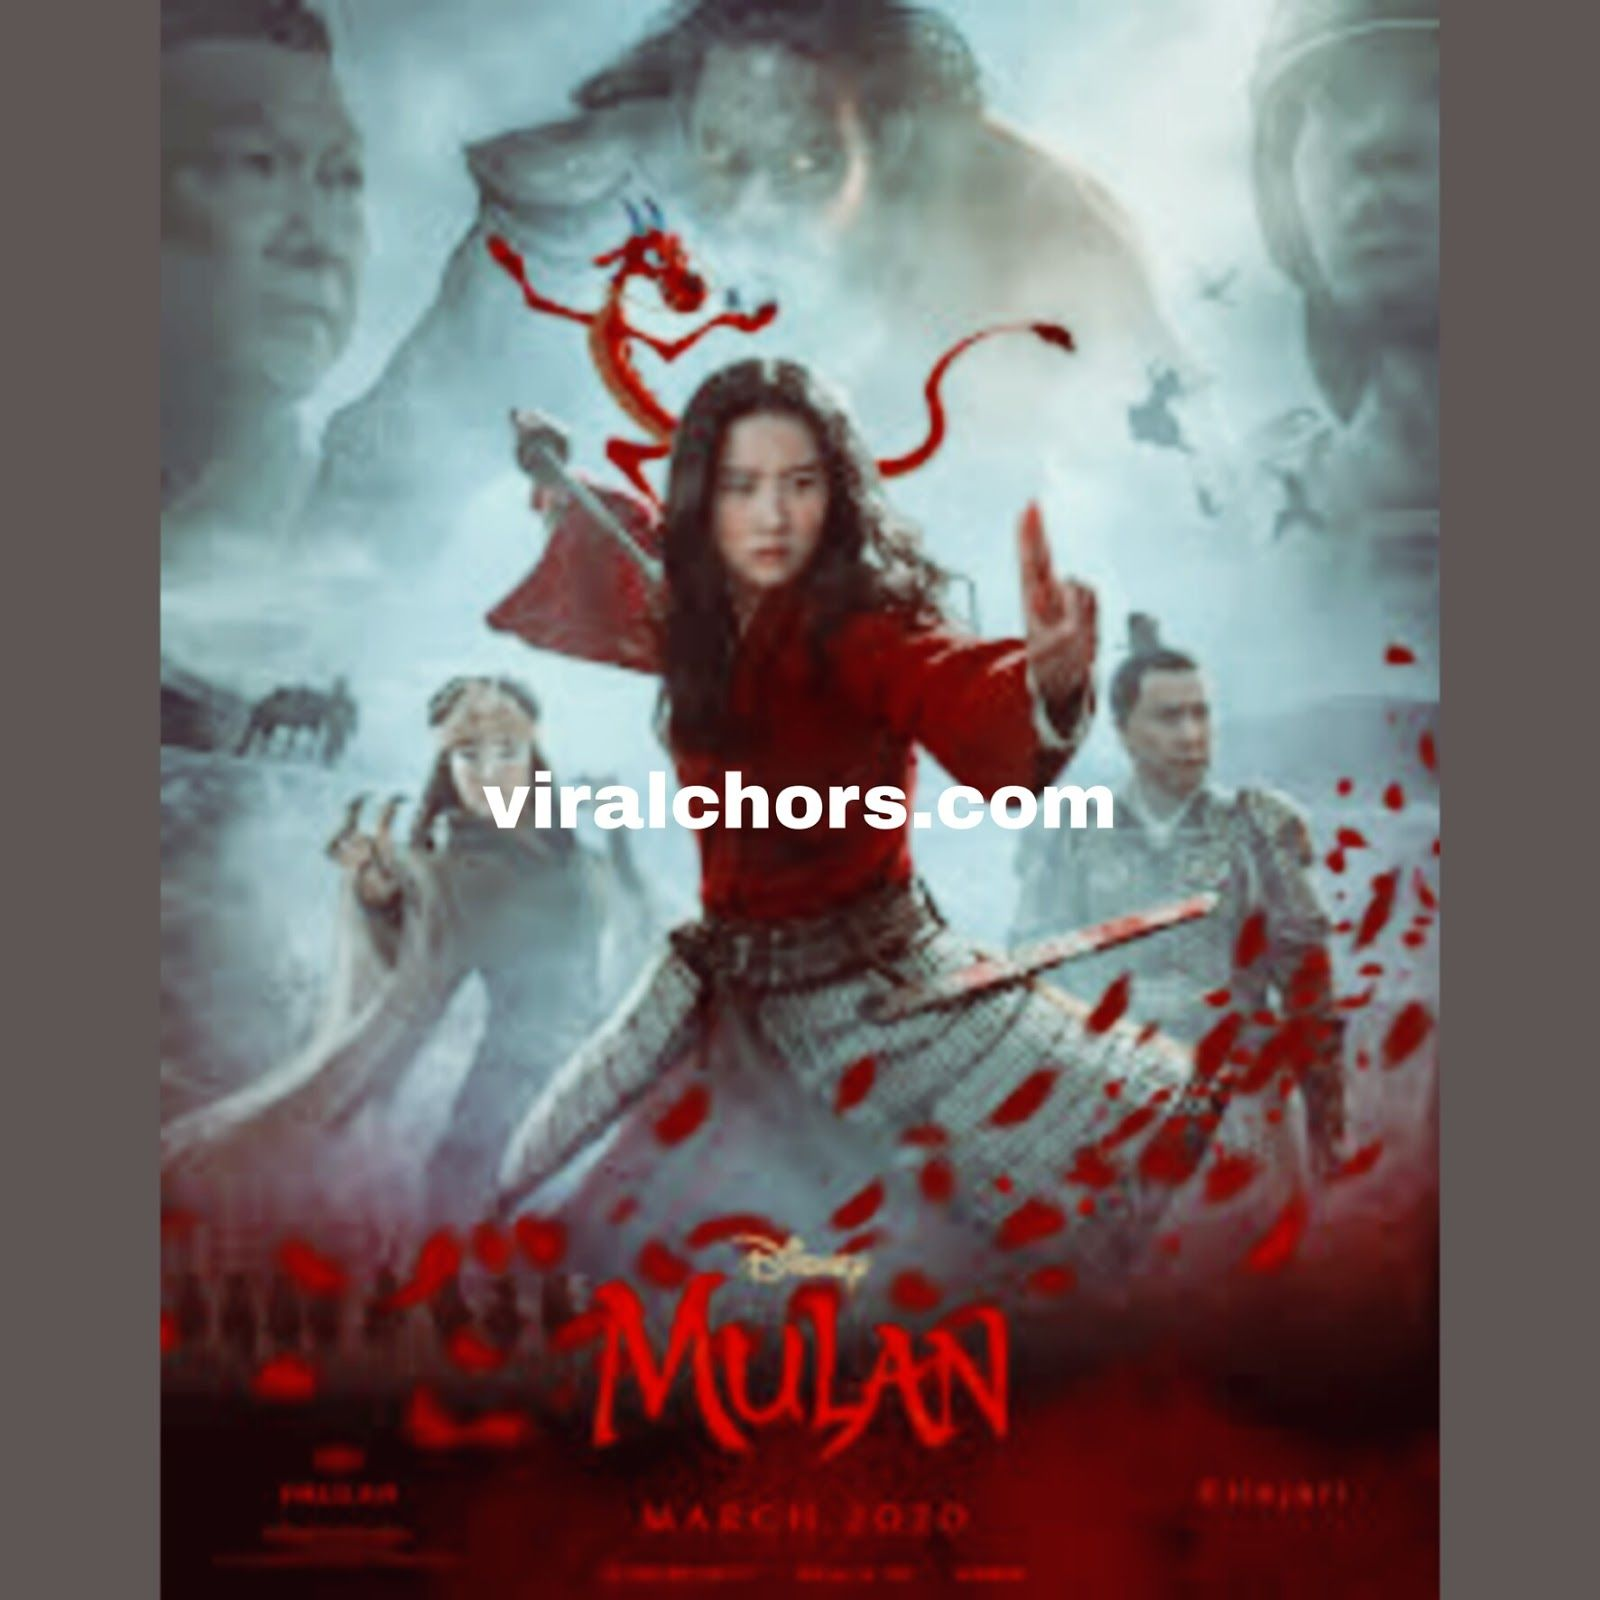 Watch Mulan (2020) Full Movie Telugu - YoutubeMoney.co